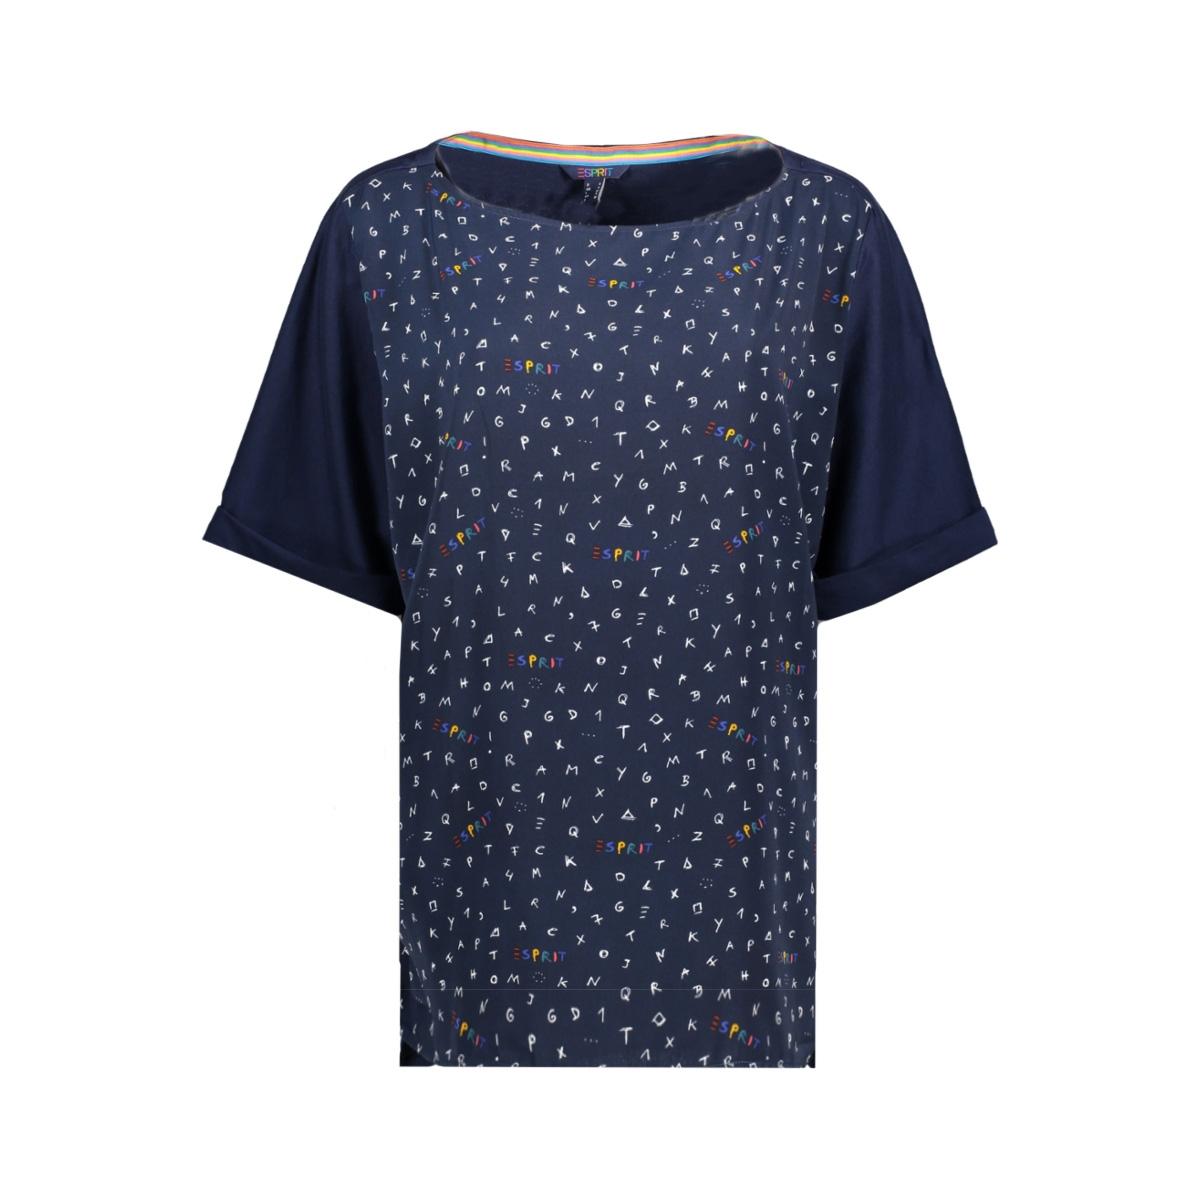 097ee1f040 esprit t-shirt e400